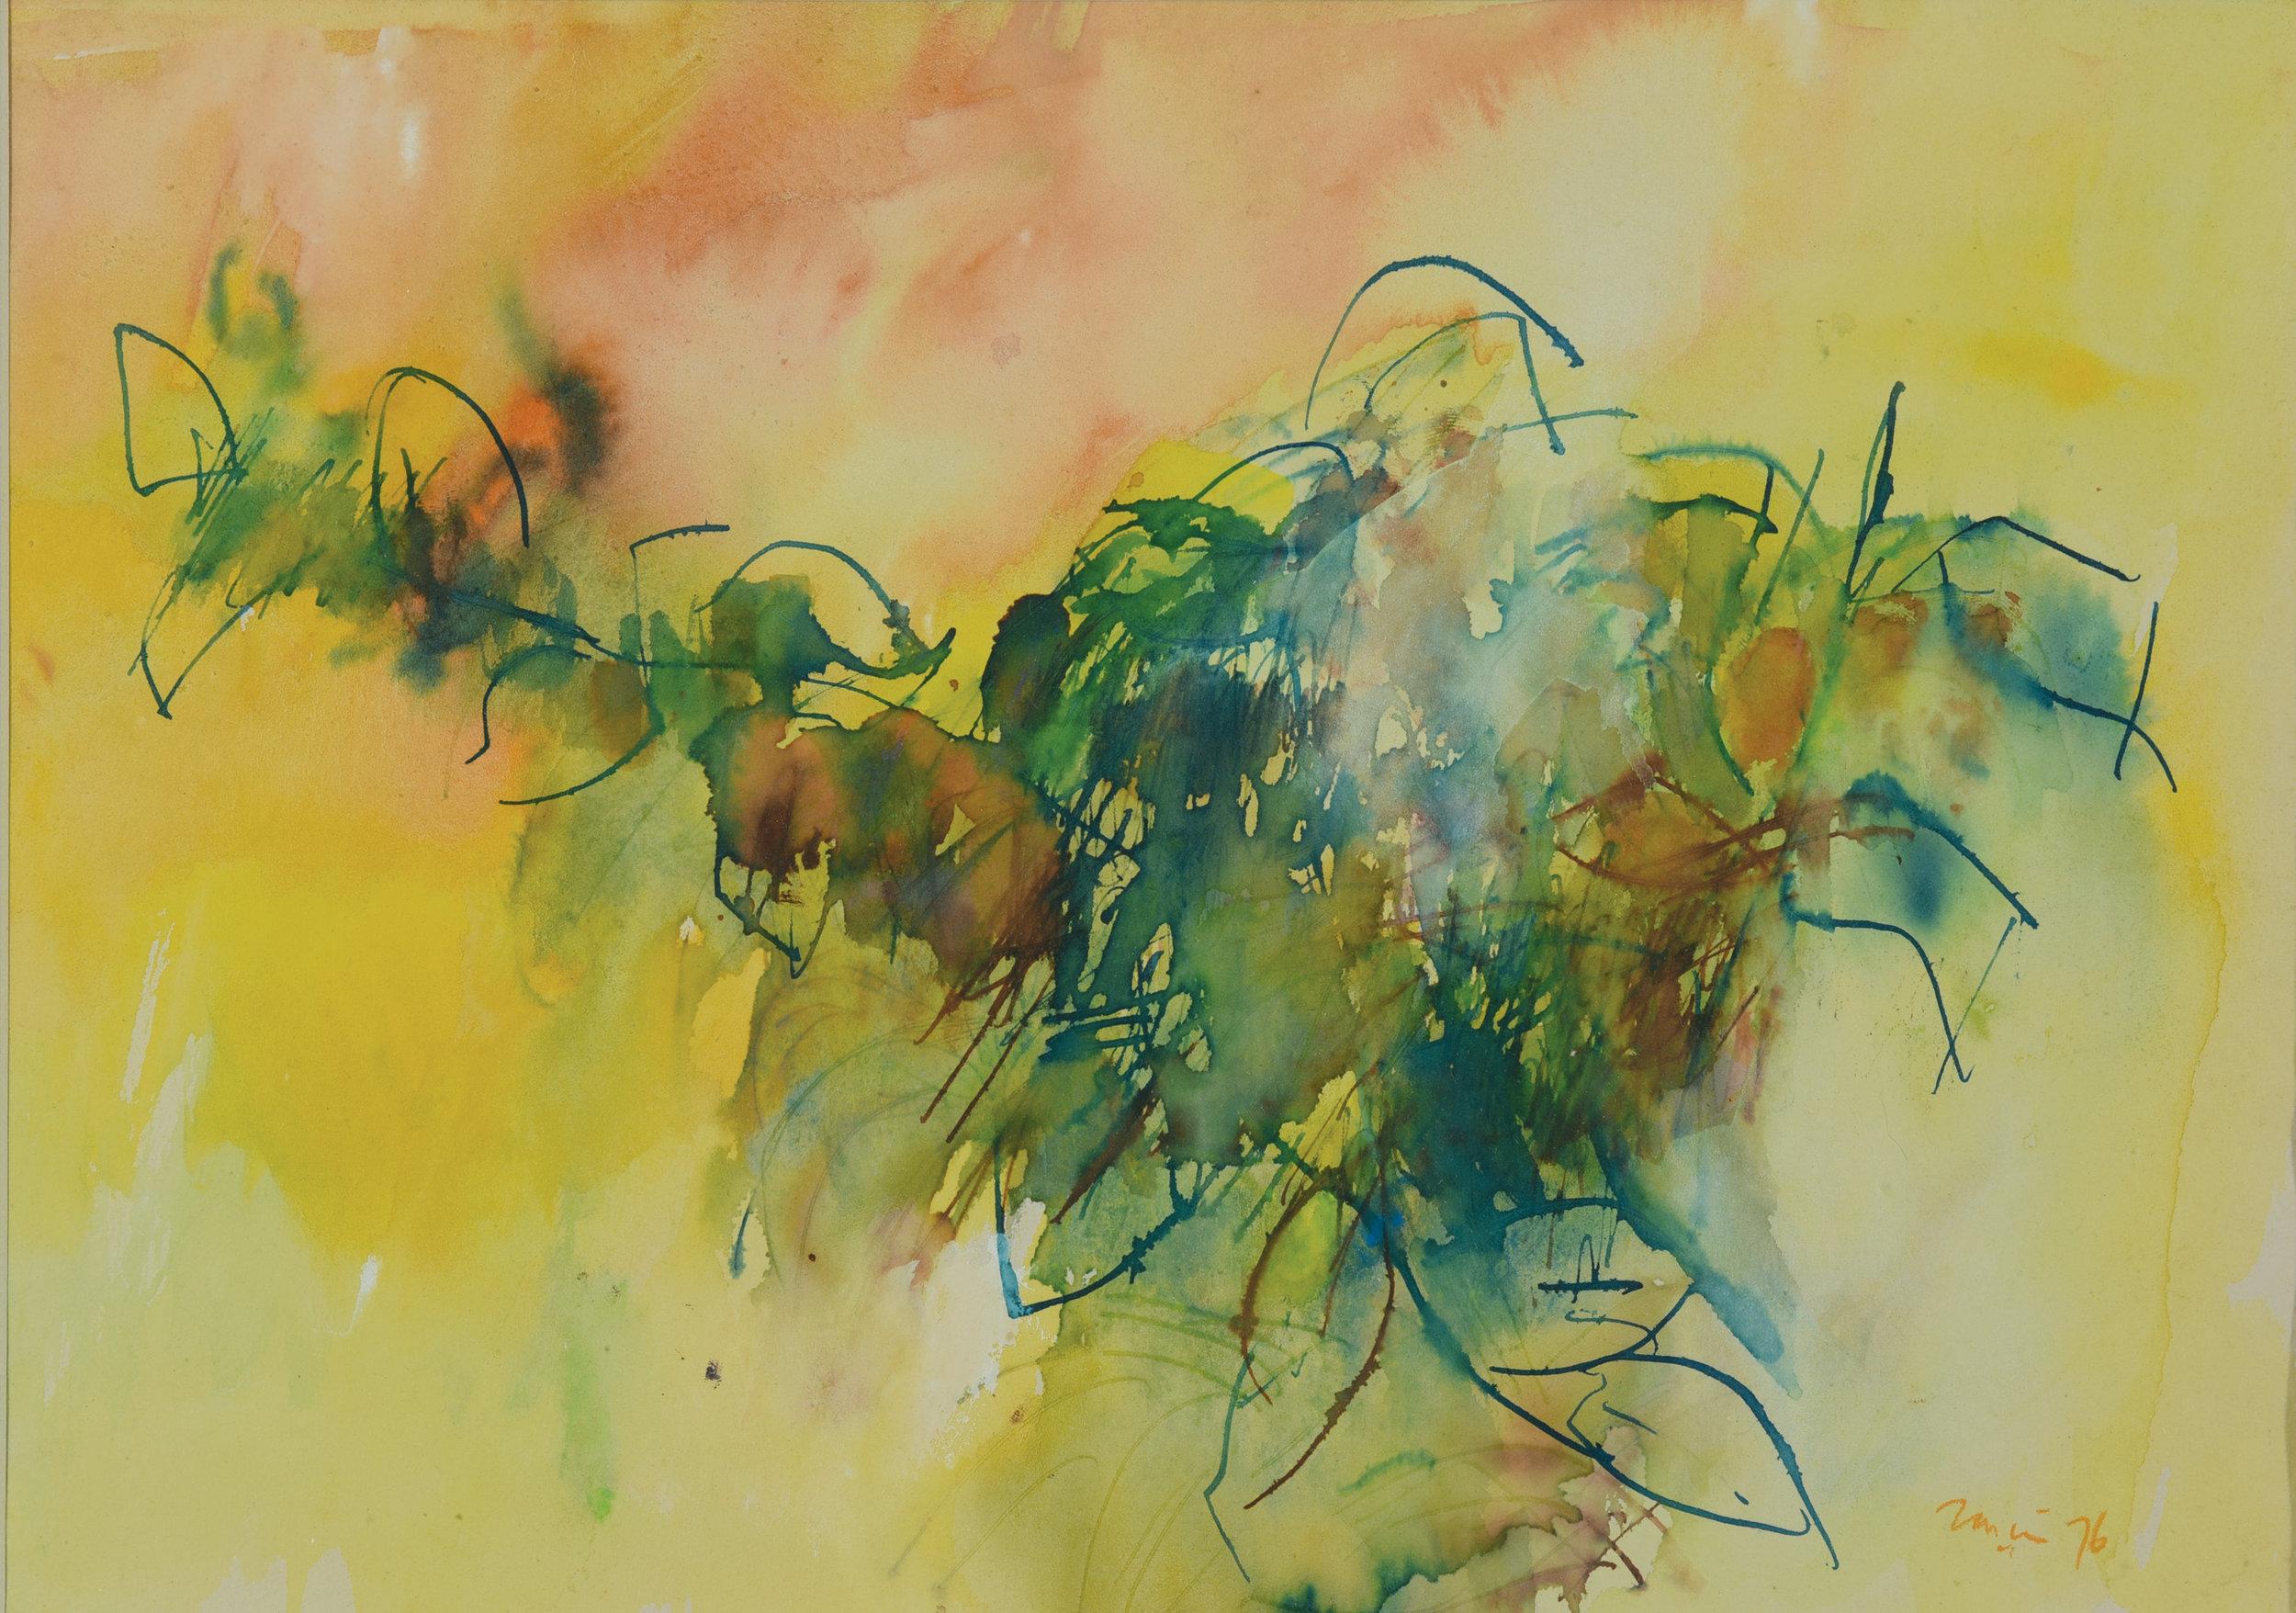 Zaini, Abstract Landscape, watercolour on paper, 28 x 39 cm, 1976